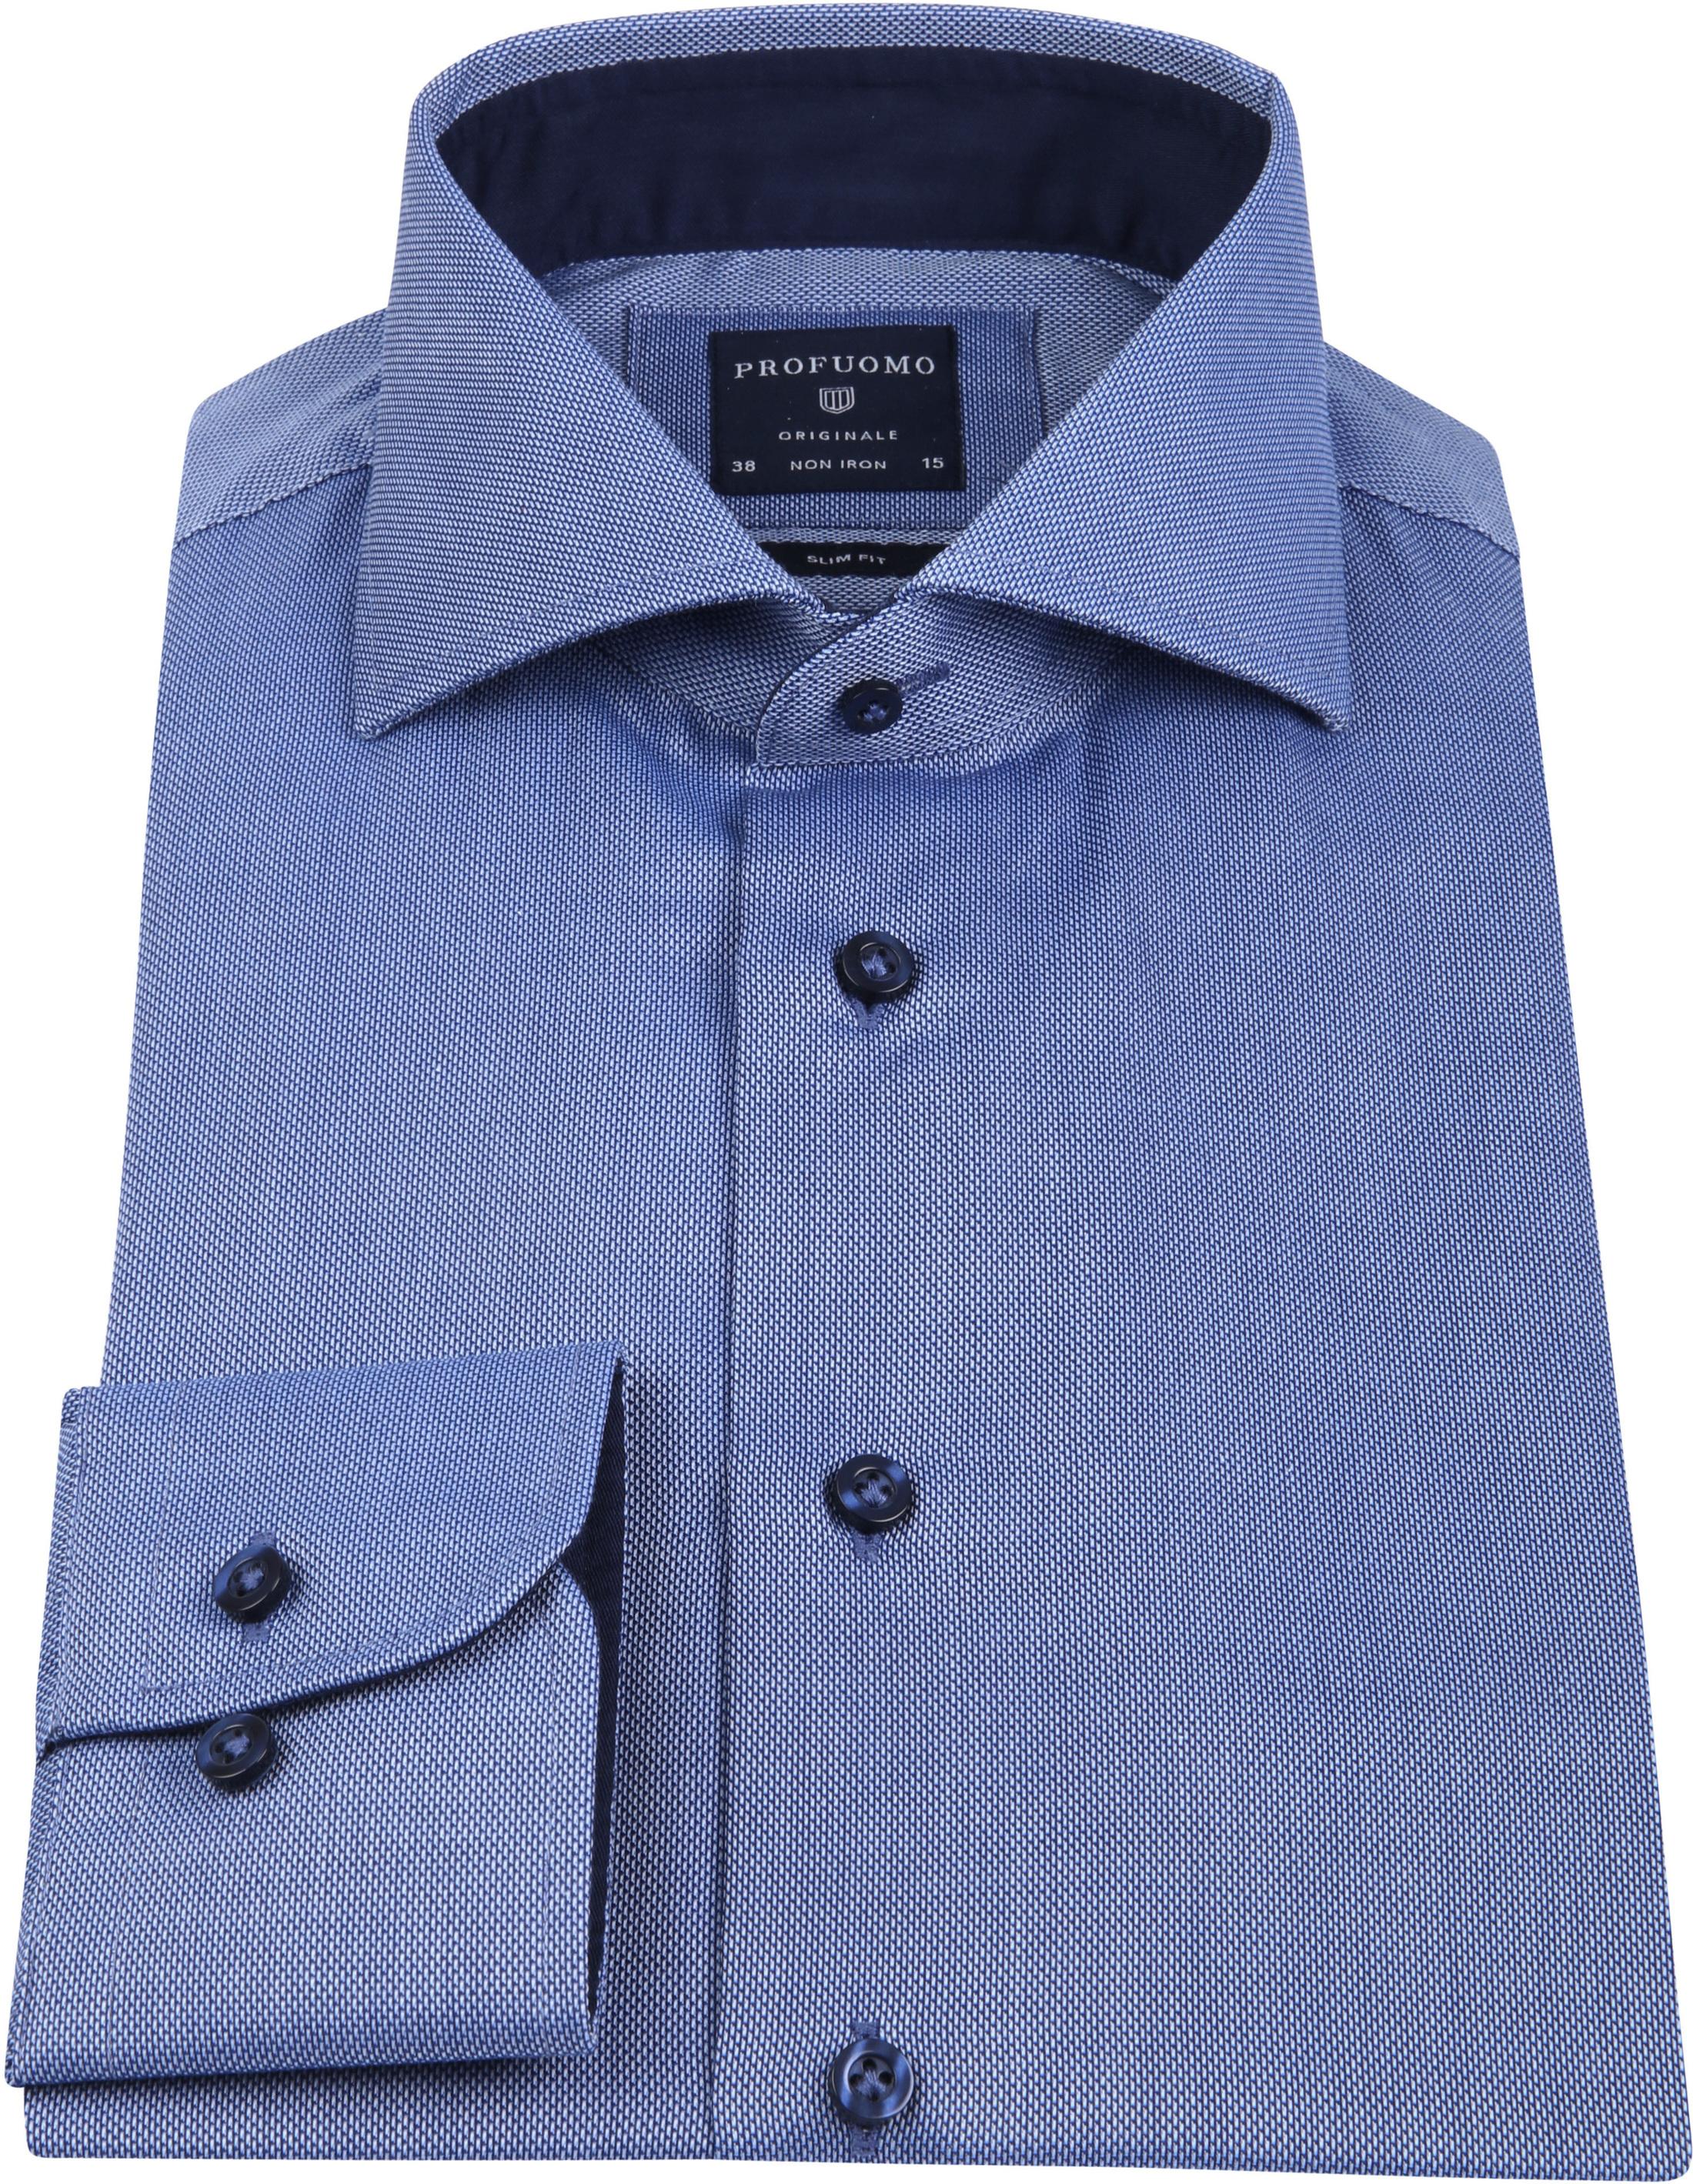 Profuomo Overhemd SF Non Iron Blauw foto 2